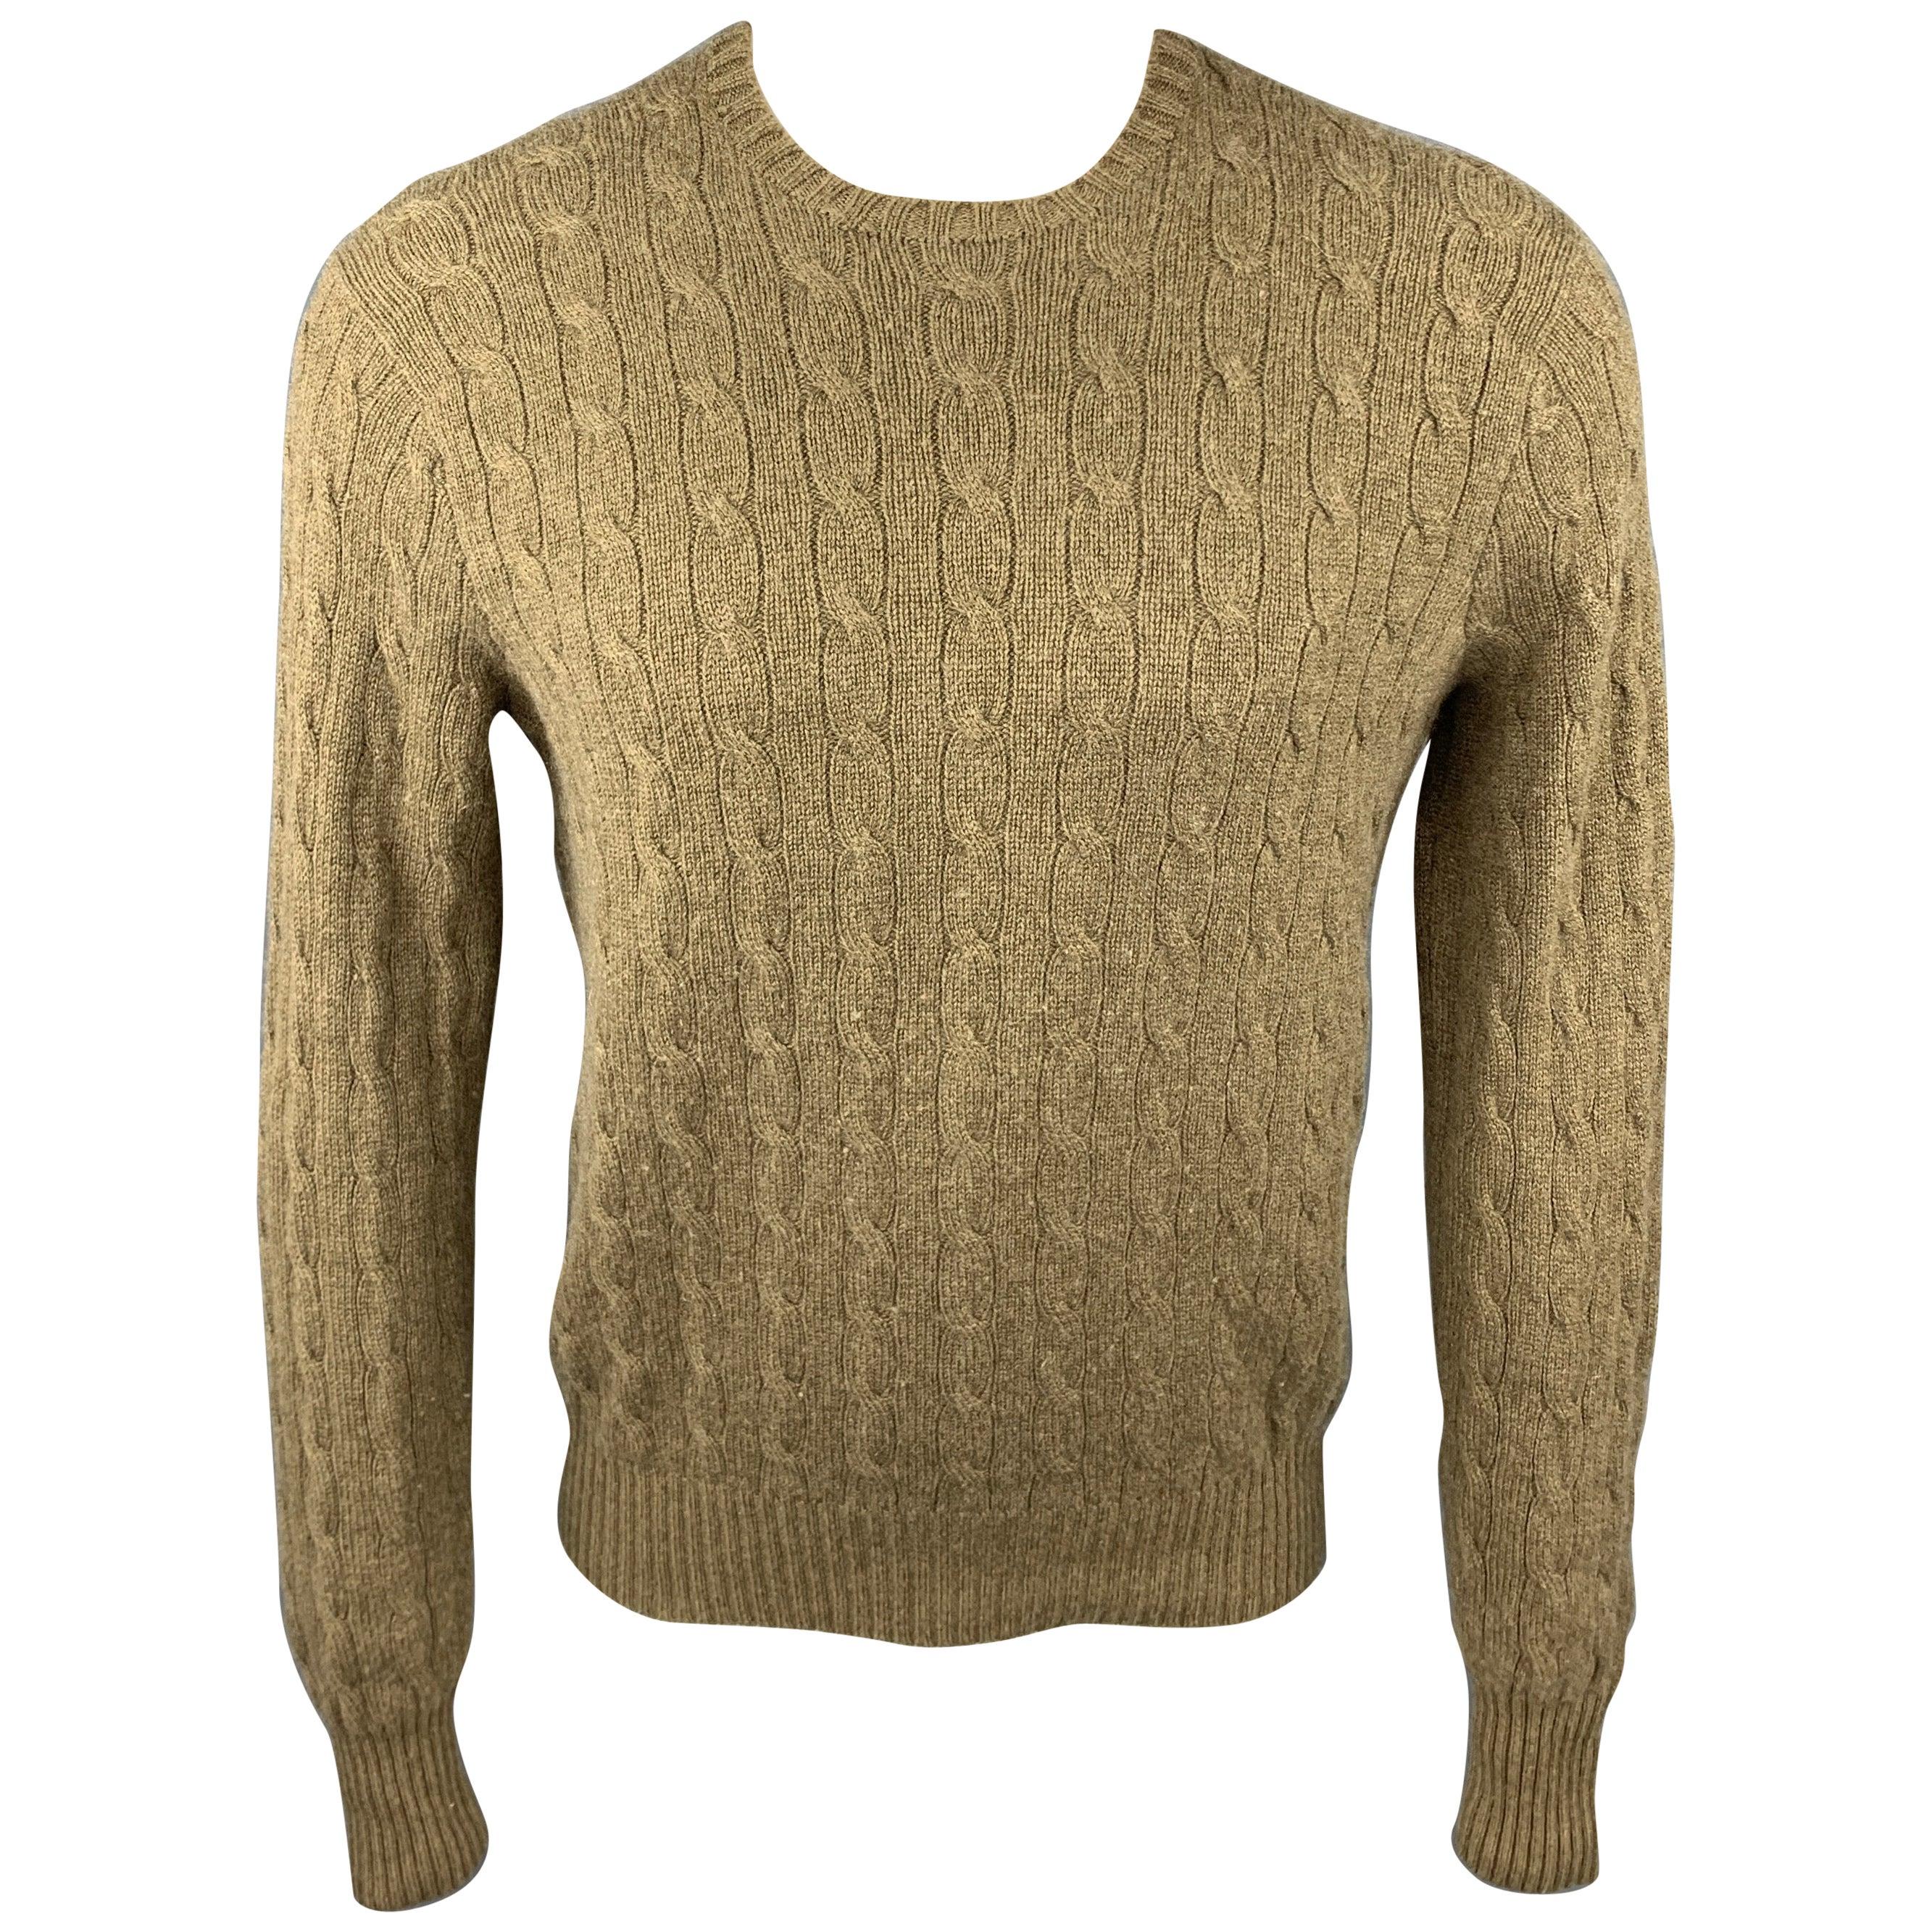 Ralph Lauren Black Label Cable-Knit Boat-Neck Sweater, Ecru